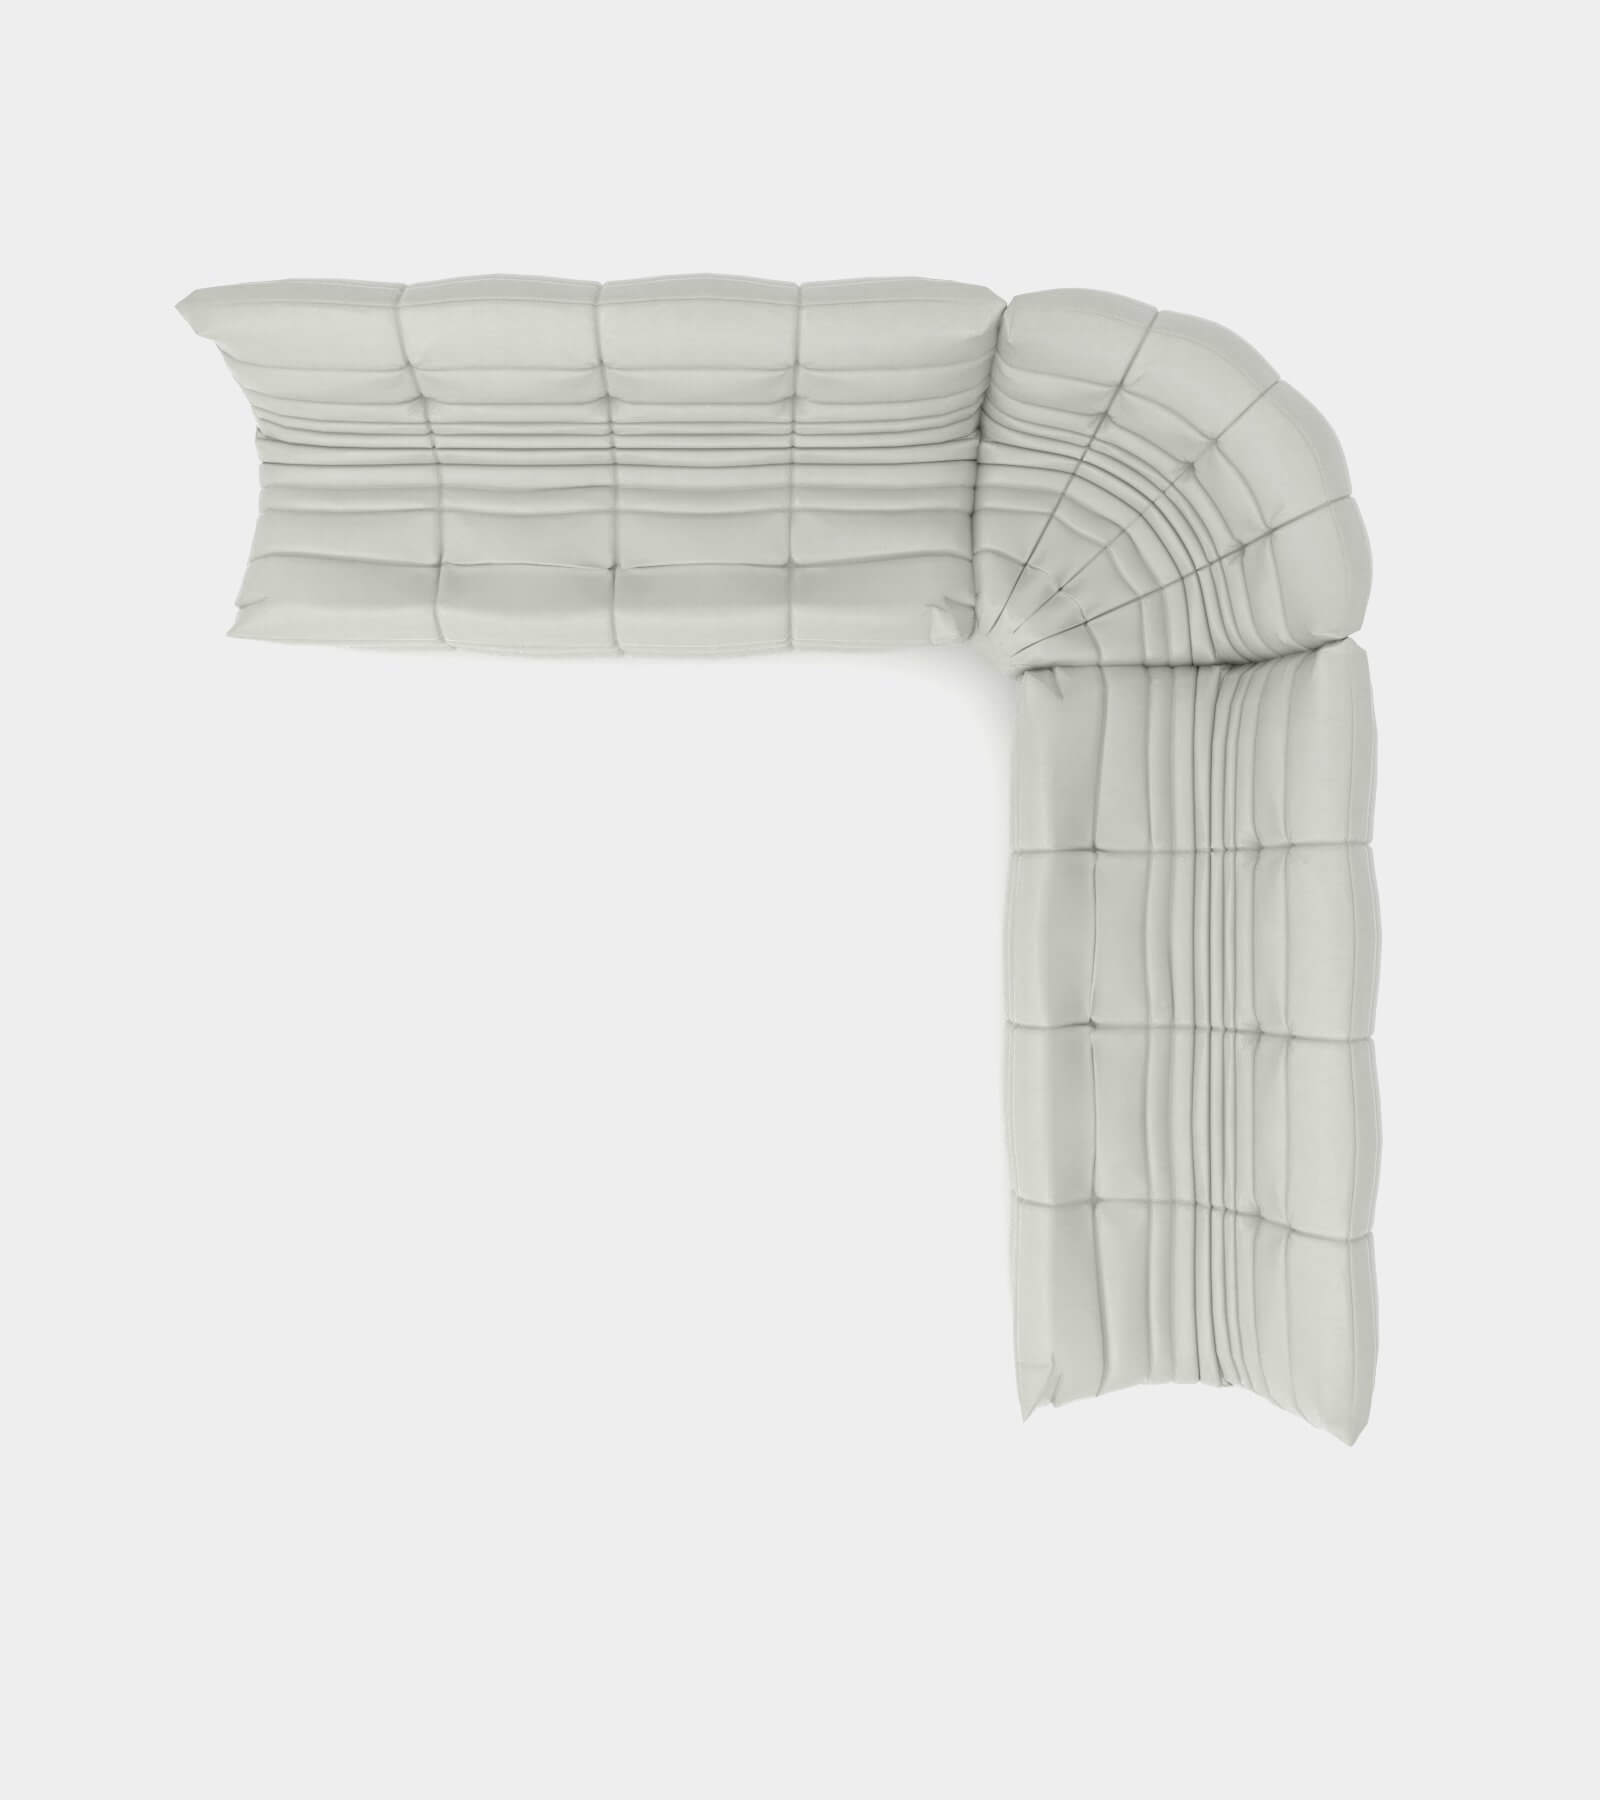 Cozy modular sofa landscape 2 - 3D Model